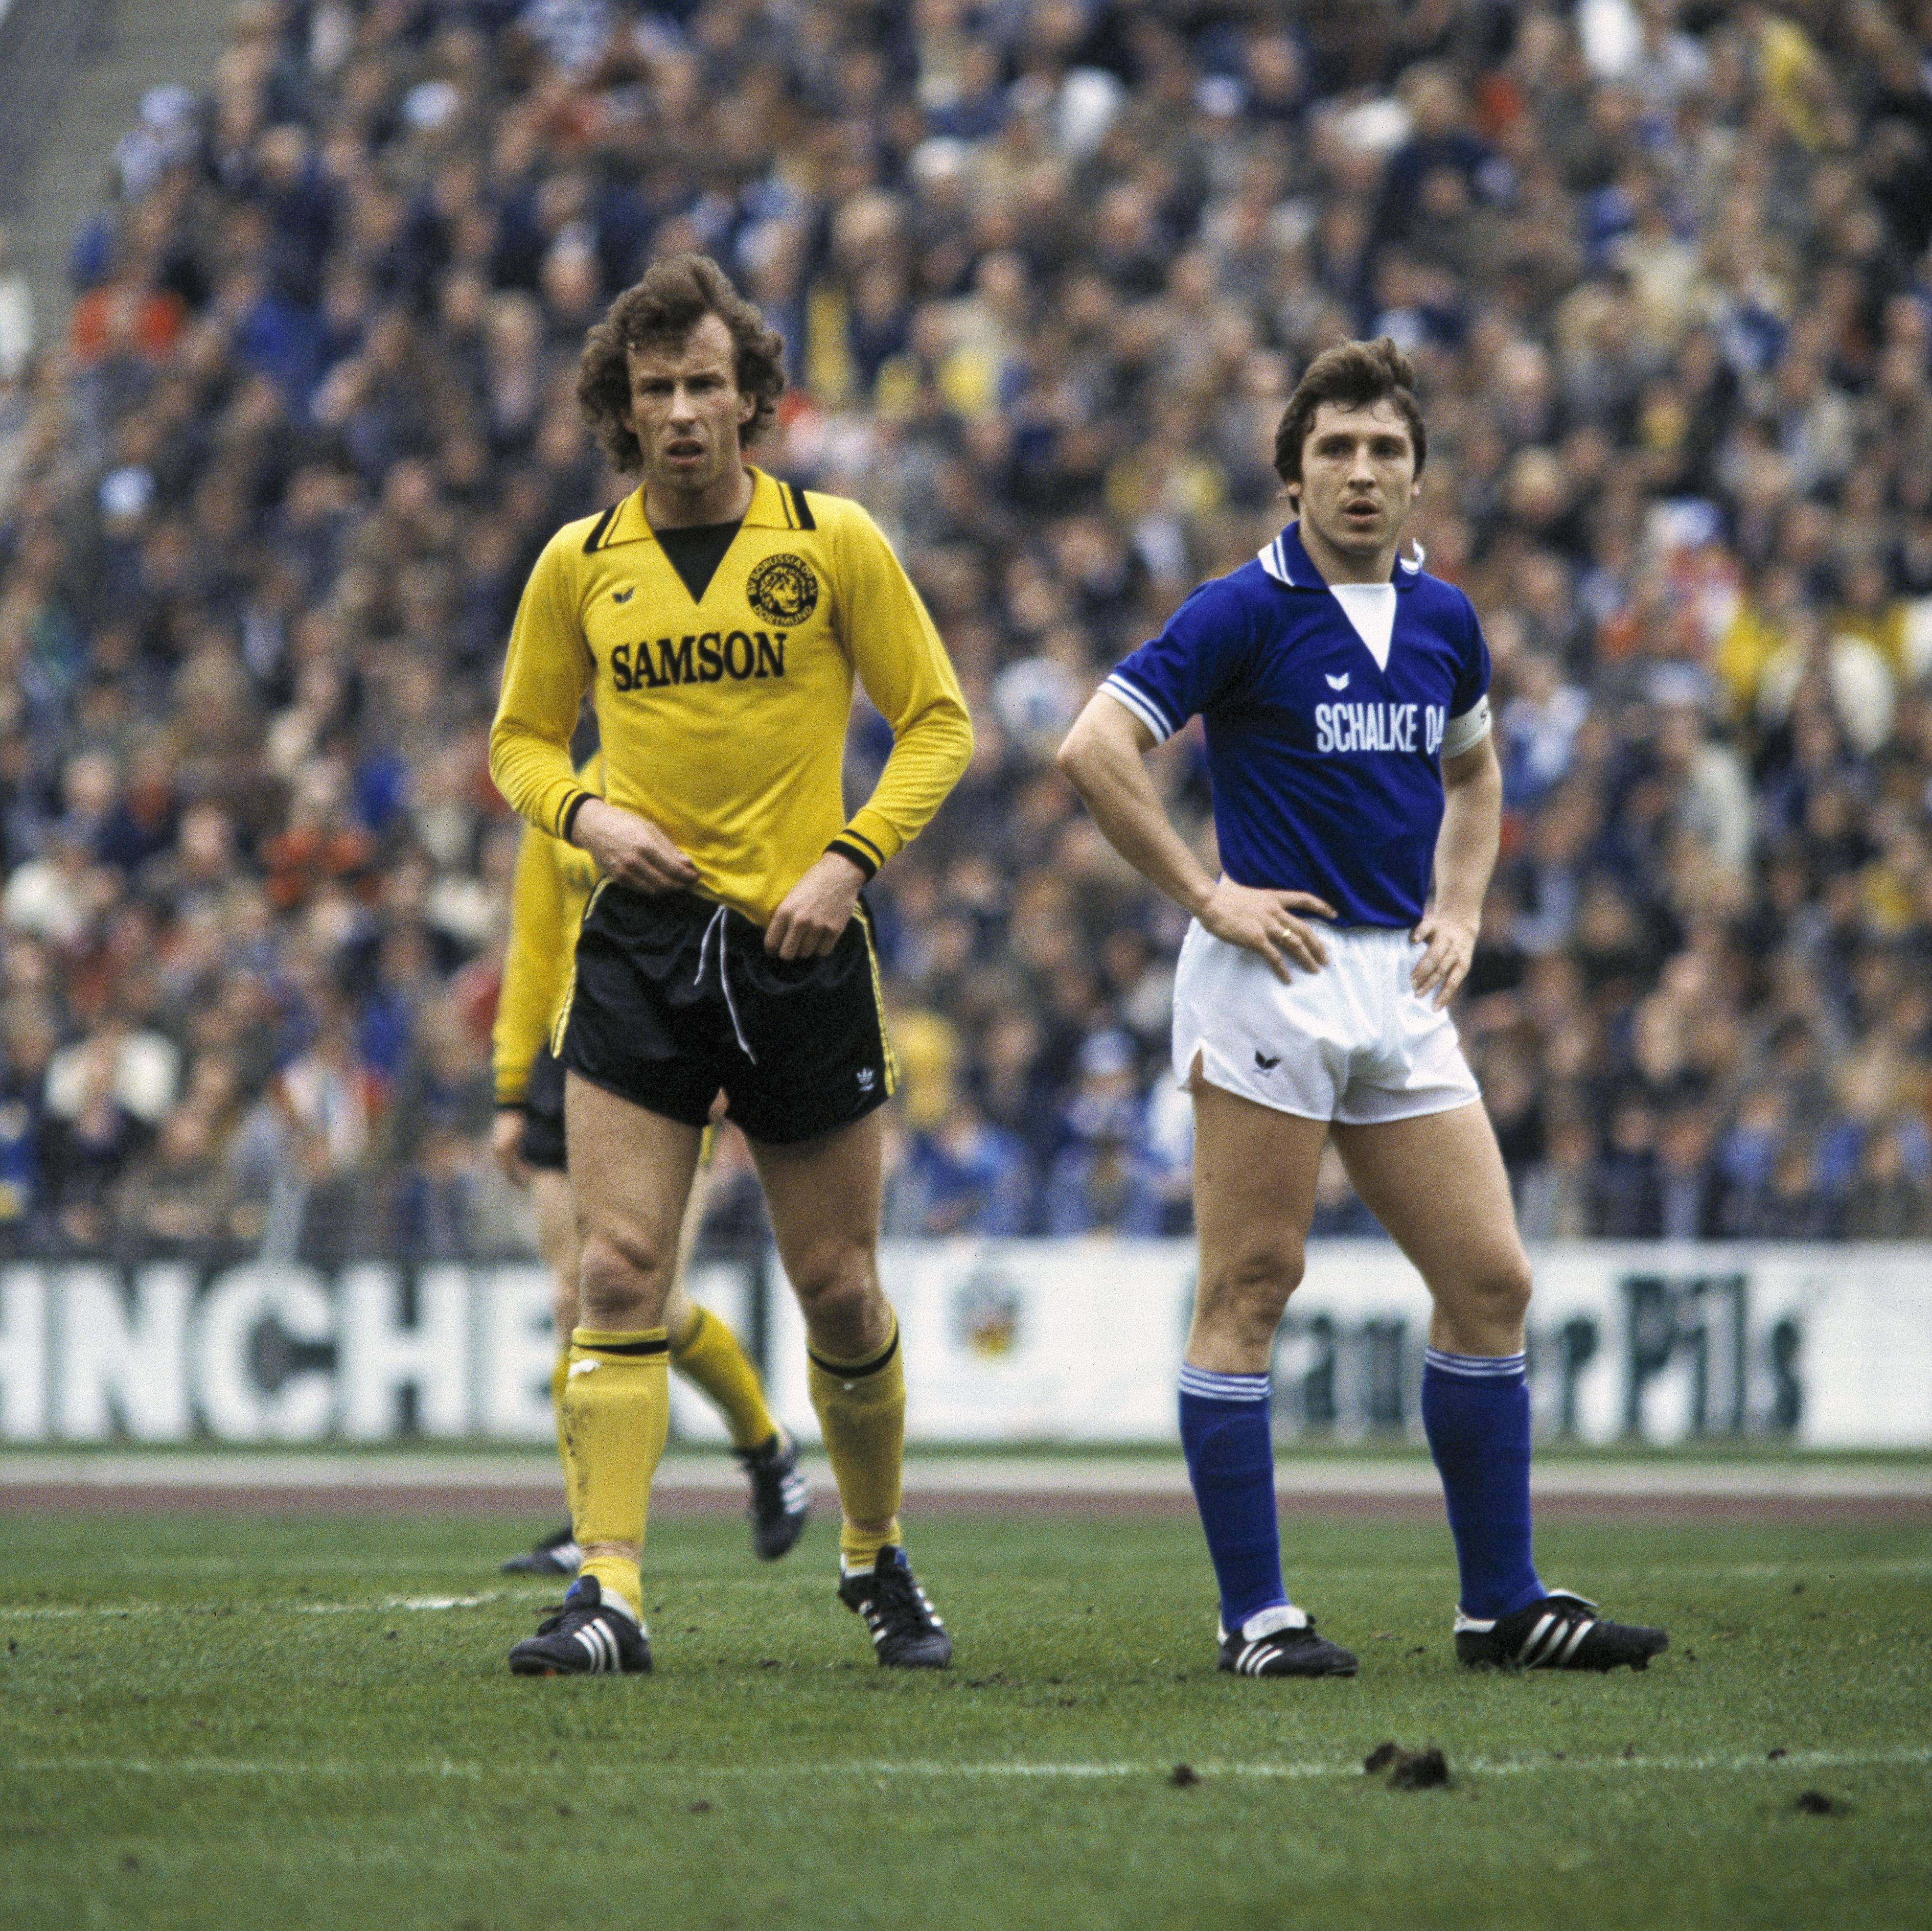 football, Bundesliga, 1977/1978, Park Stadium, FC Schalke 04 versus Borussia Dortmund 0:2, scene of the match, Amand Theis (BVB) left and Klaus Fischer (S04)